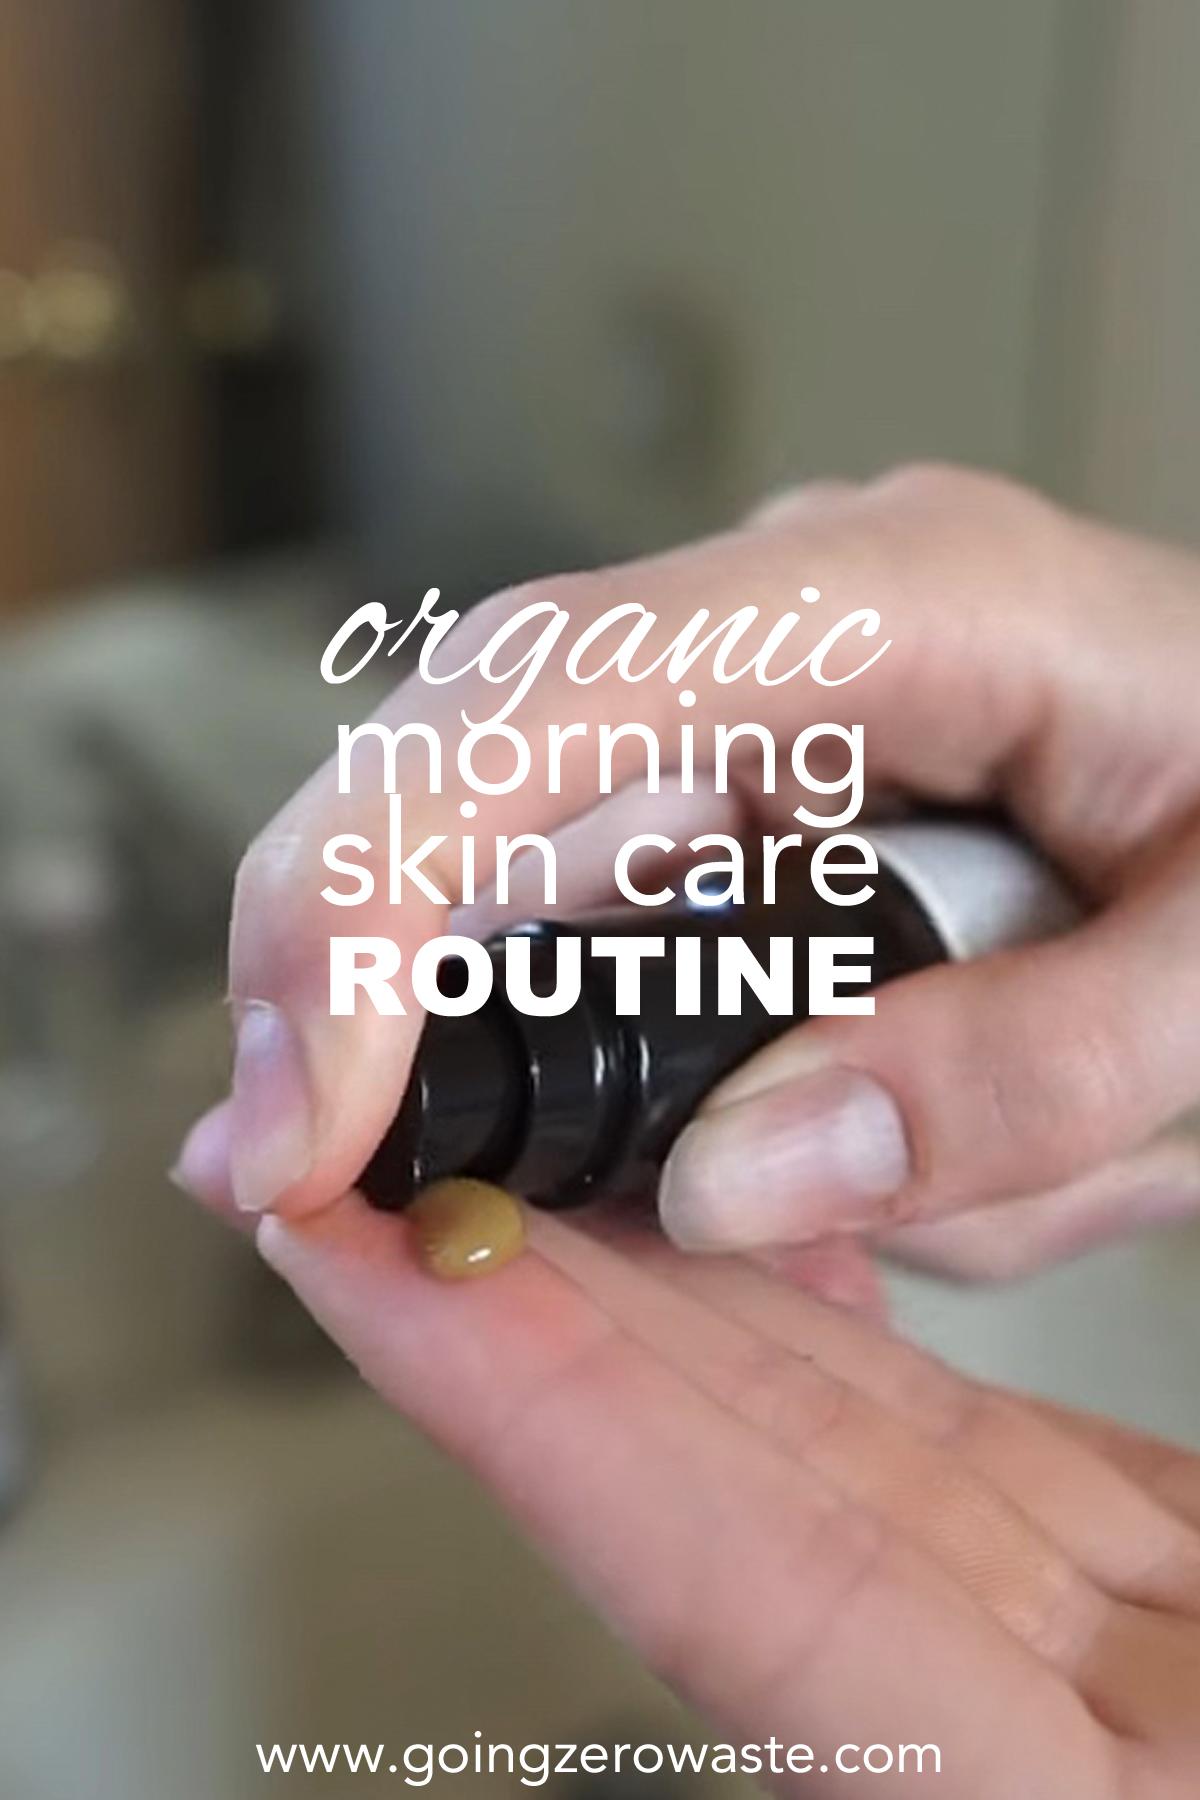 Organic, Morning Skin Care Routine from www.goingzerowaste.com